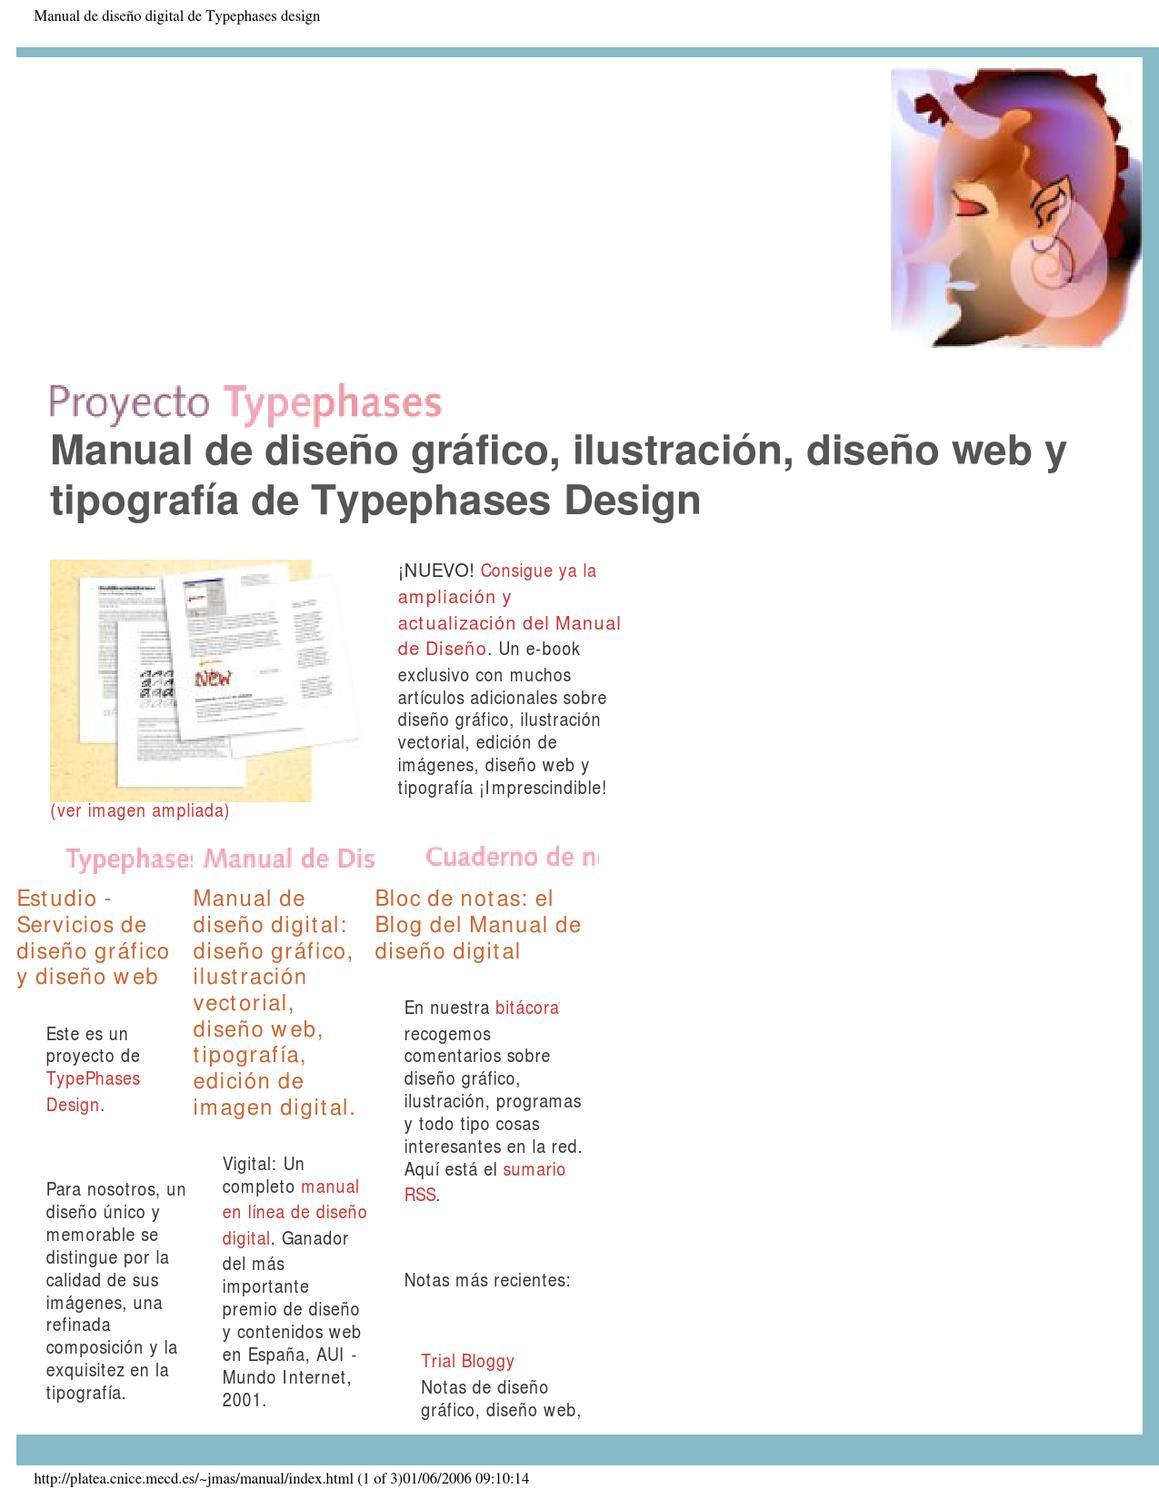 Diseño gráfico by mariuxi soto - issuu